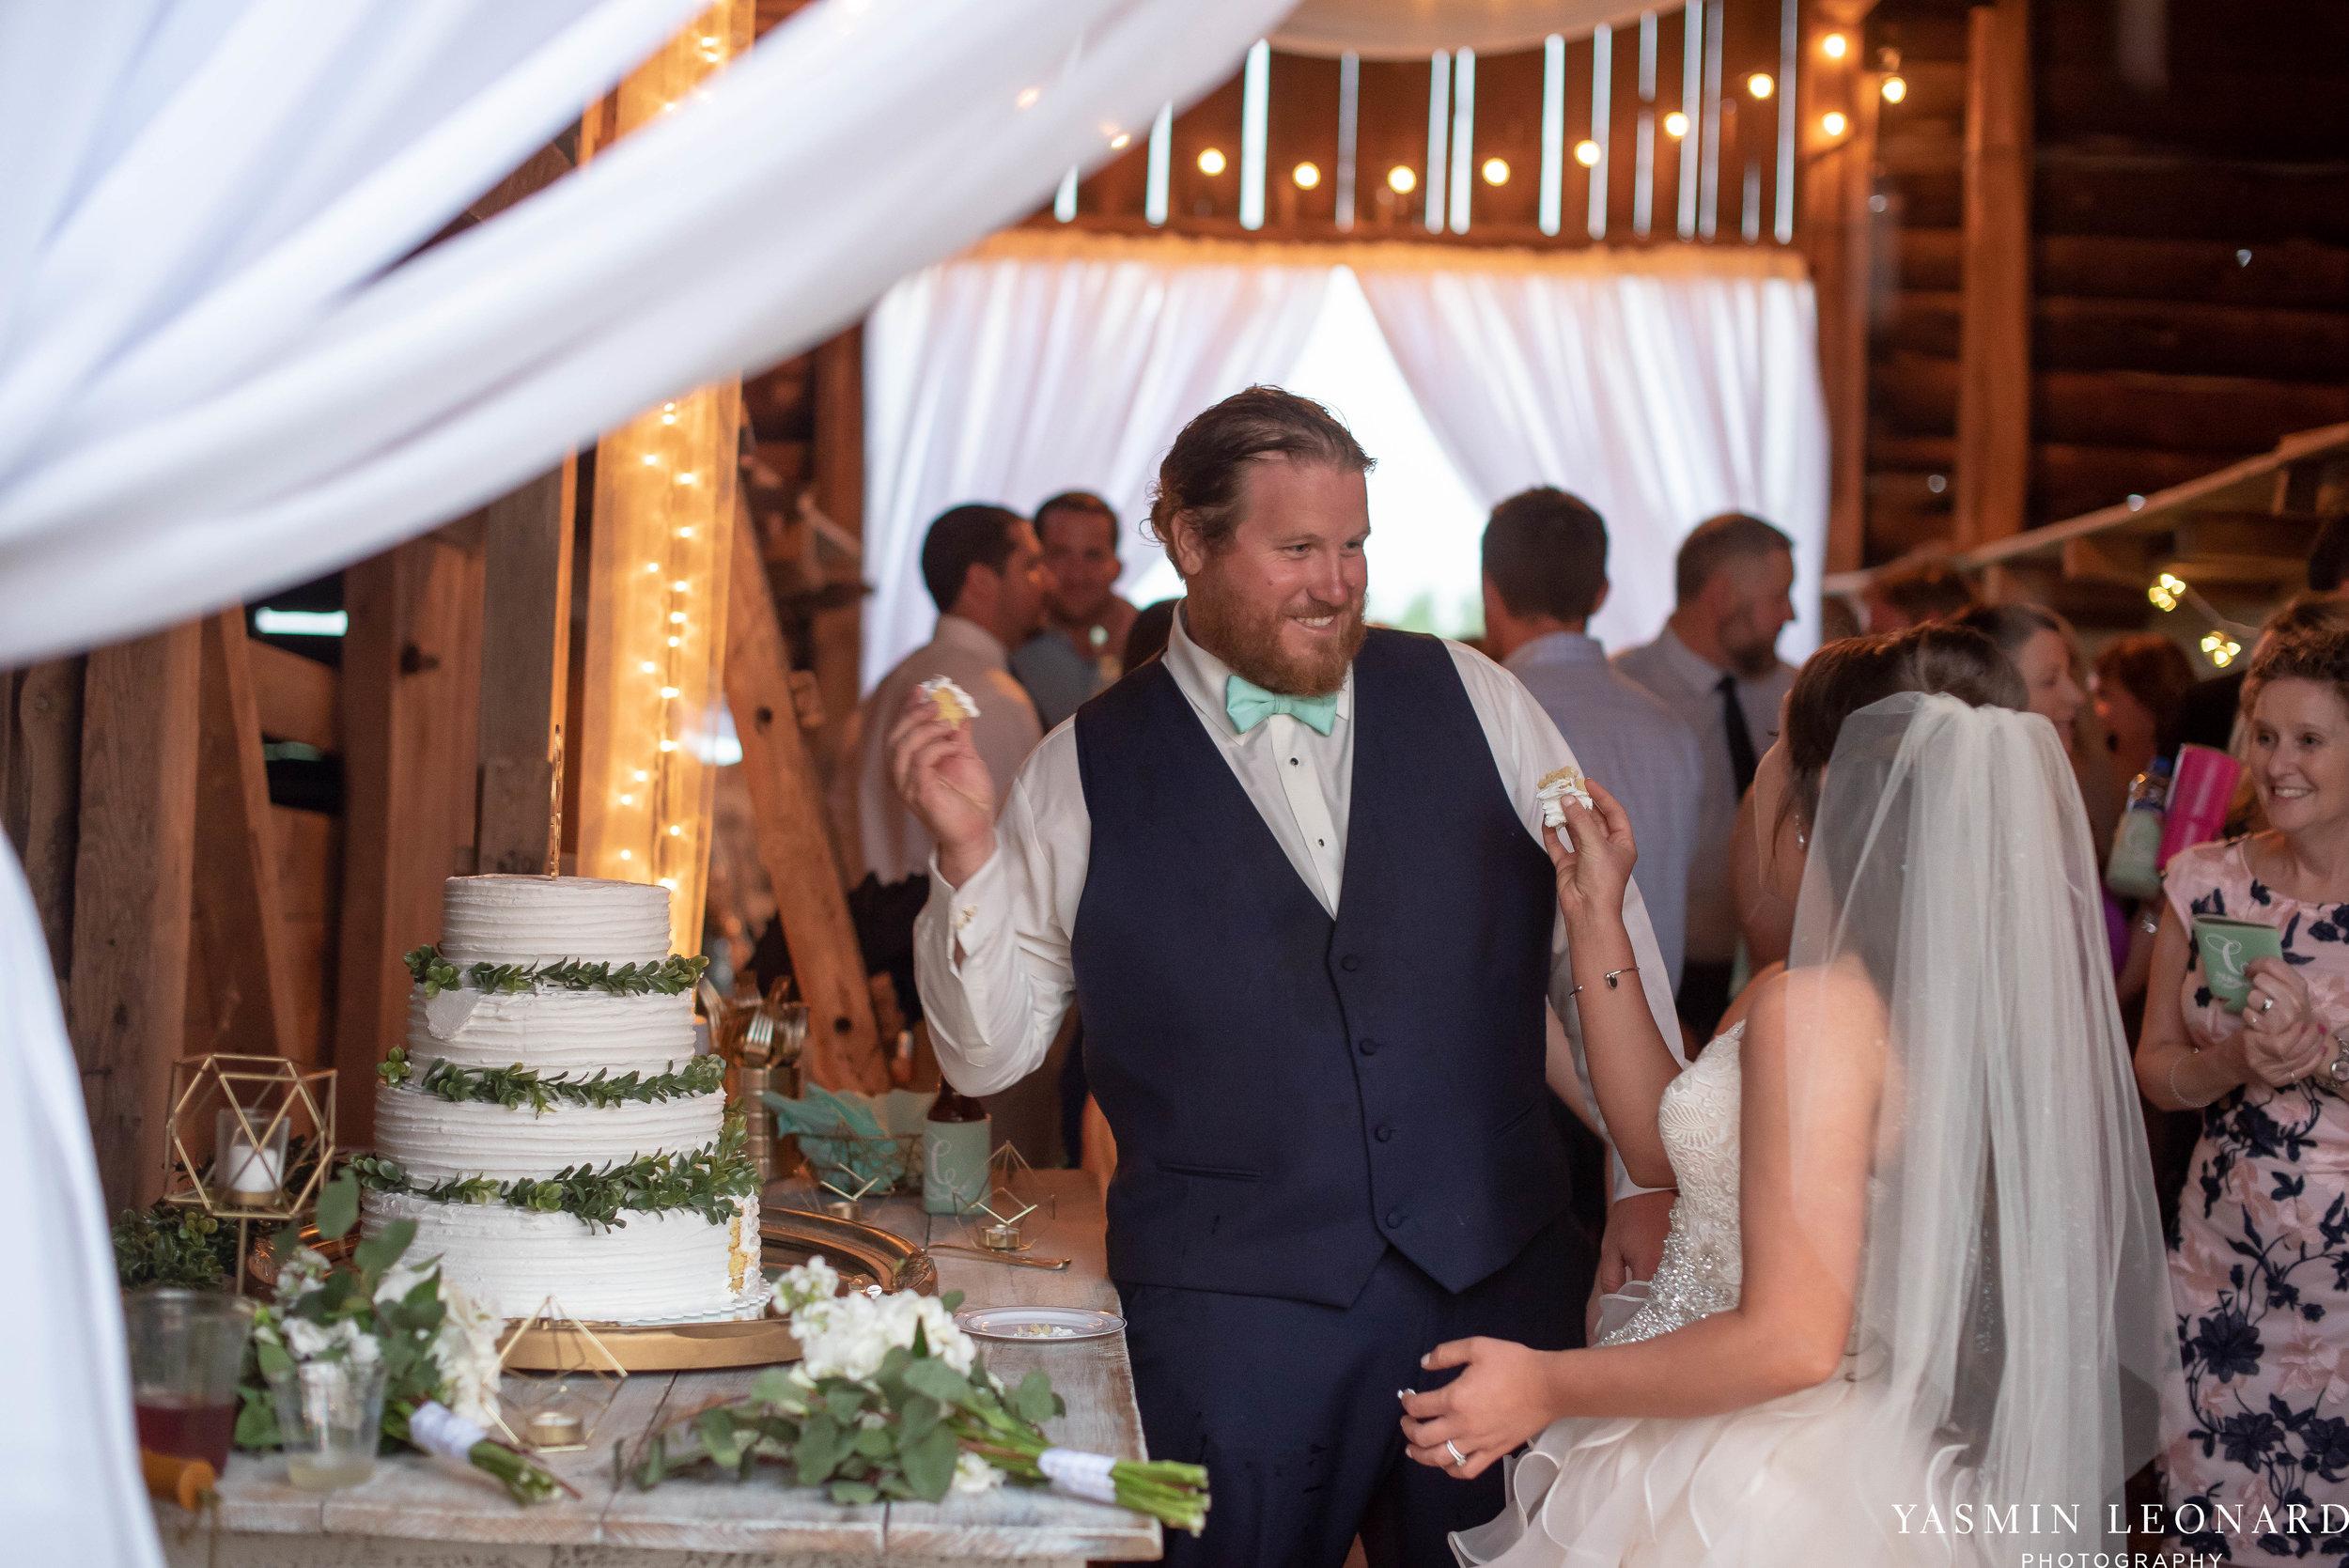 Rain on your wedding day - Rainy Wedding - Plan B for Rain - What to do if it rains on your wedding day - Wedding Inspiration - Outdoor wedding ideas - Rainy Wedding Pictures - Yasmin Leonard Photography-66.jpg